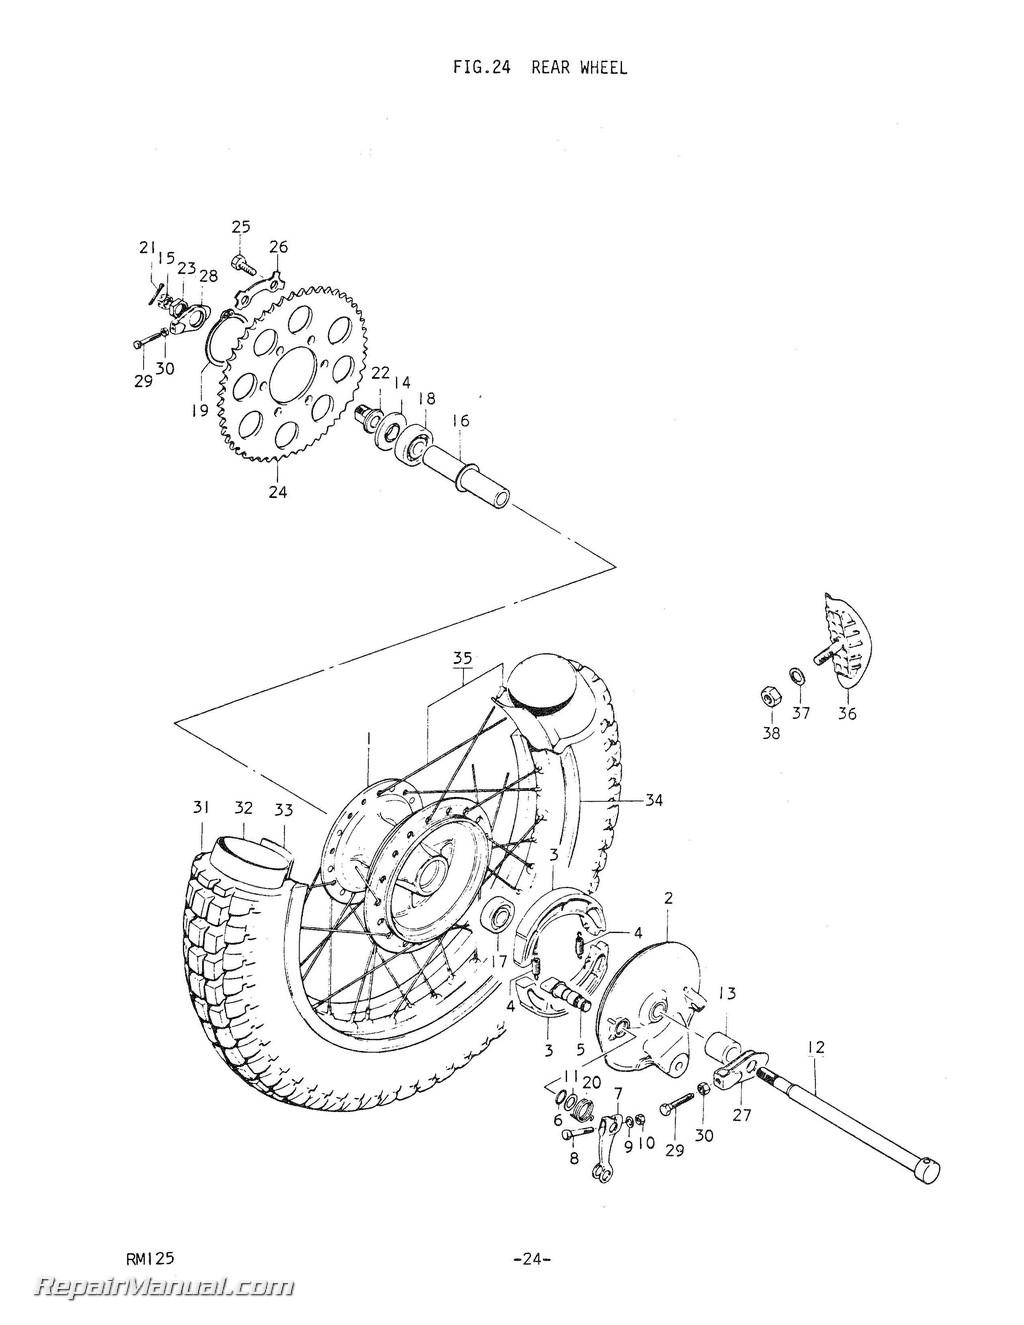 Suzuki Rm125m Motorcycle Parts Manual